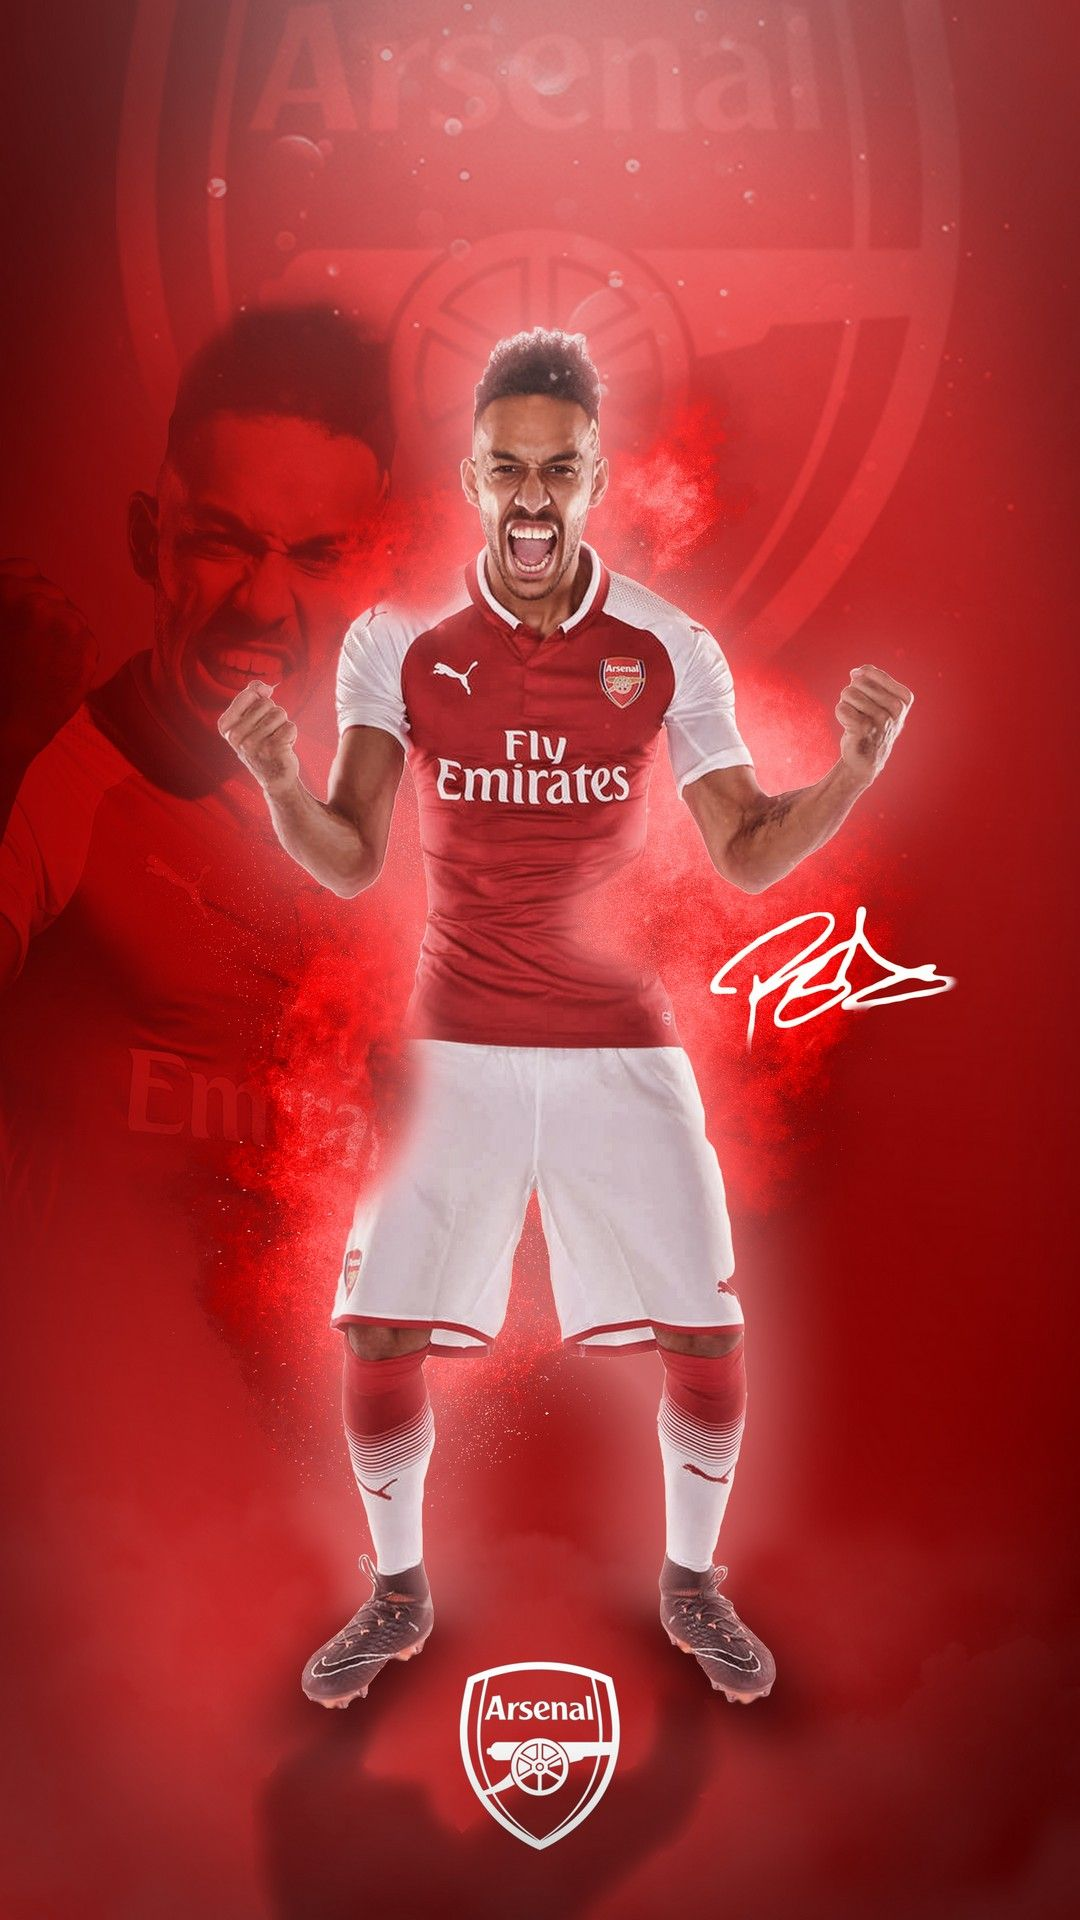 Aubameyang Arsenal Players Android Wallpaper   2019 Android 1080x1920